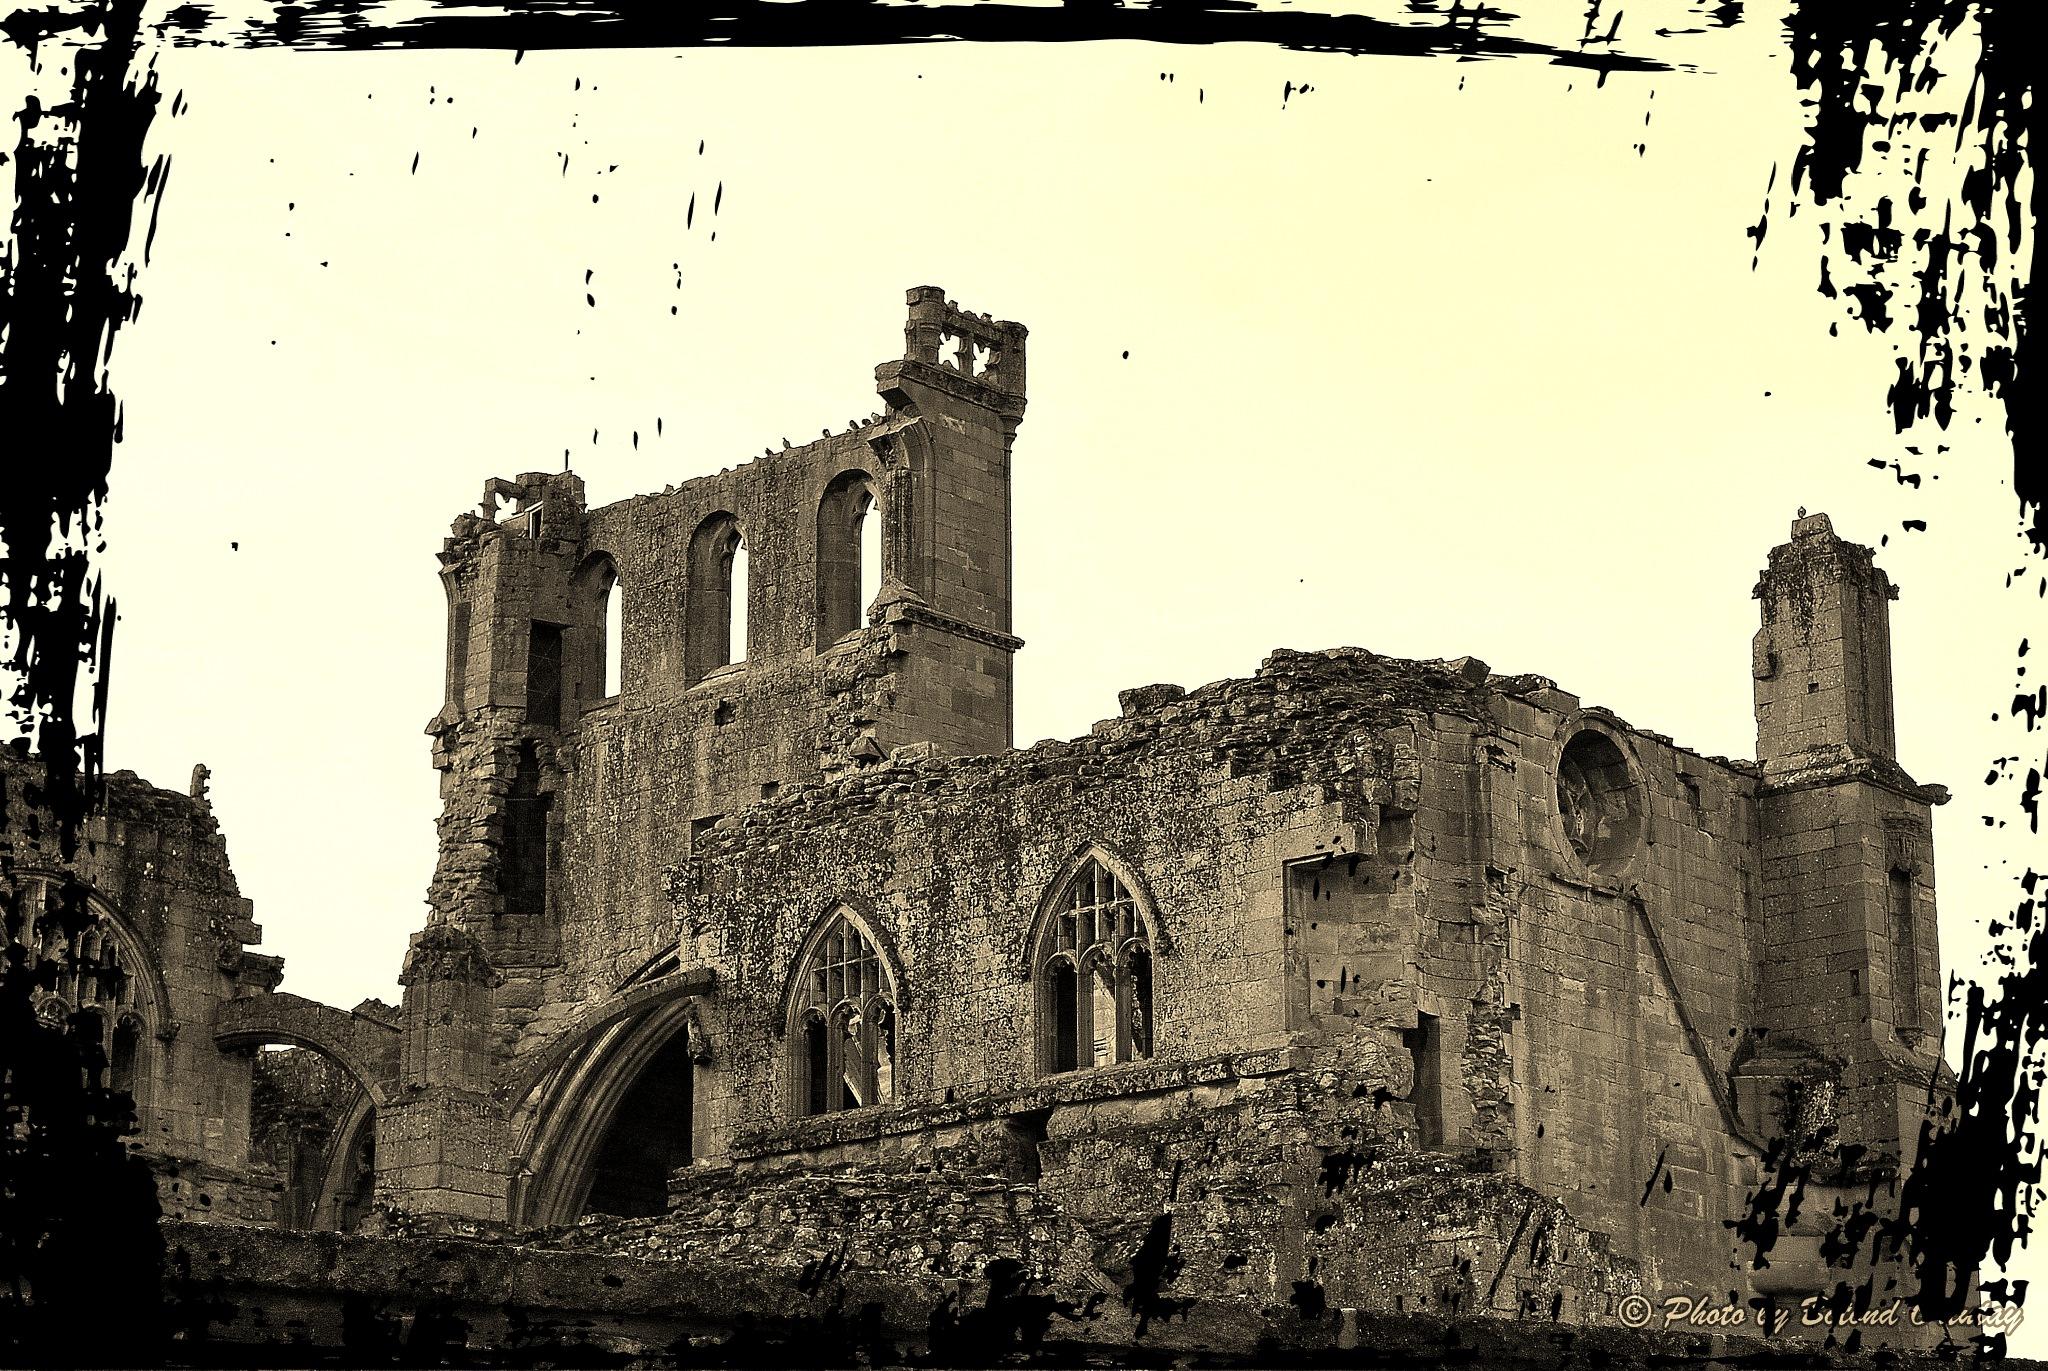 Melrose Abbey 2 by Botond Ortutay